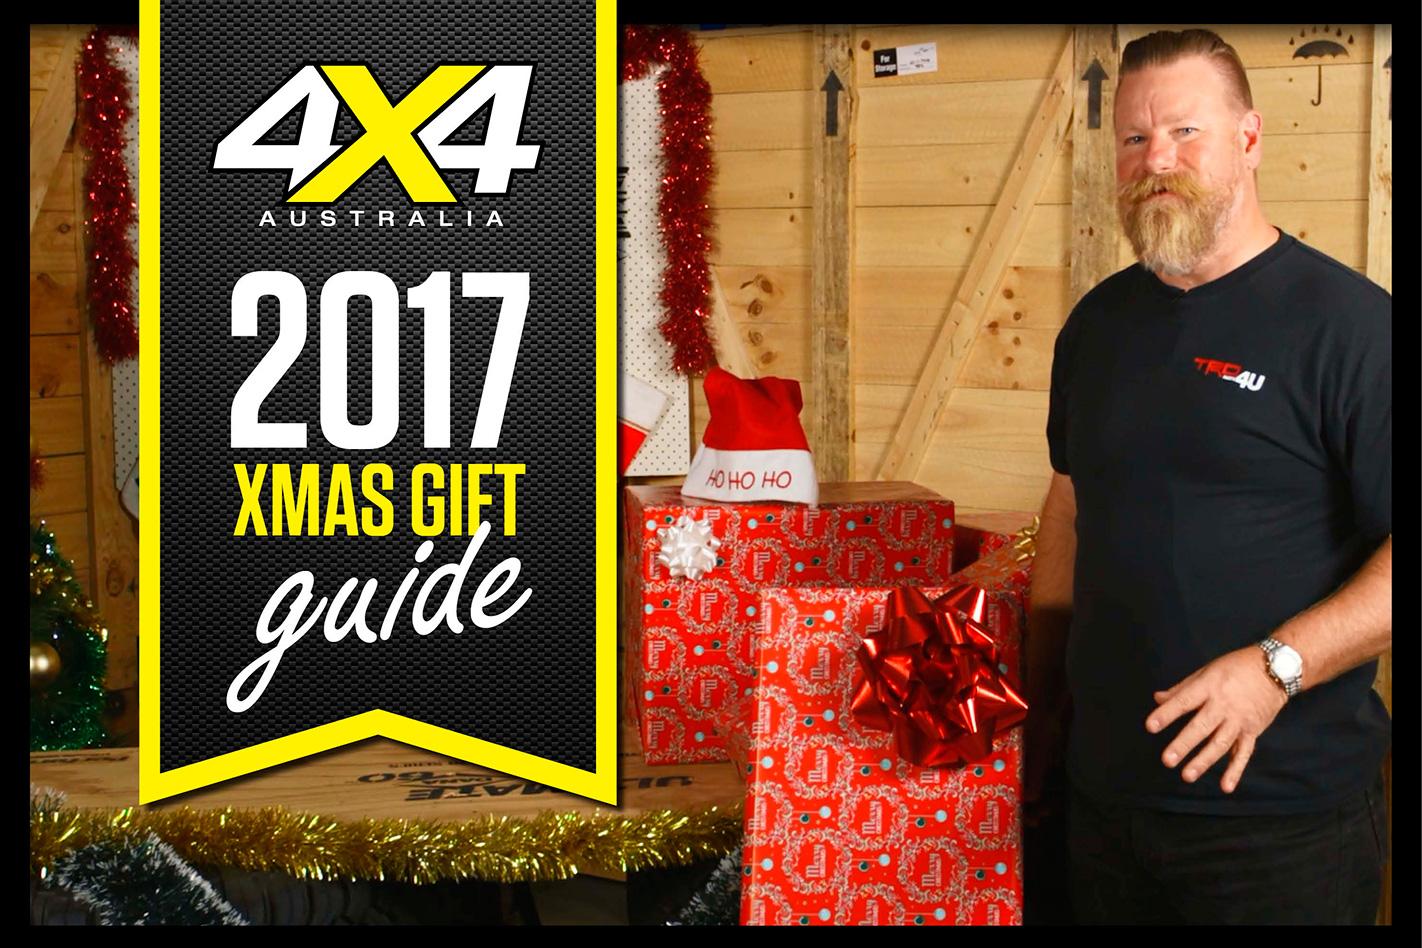 Xmas-Gift-Guide nw.jpg